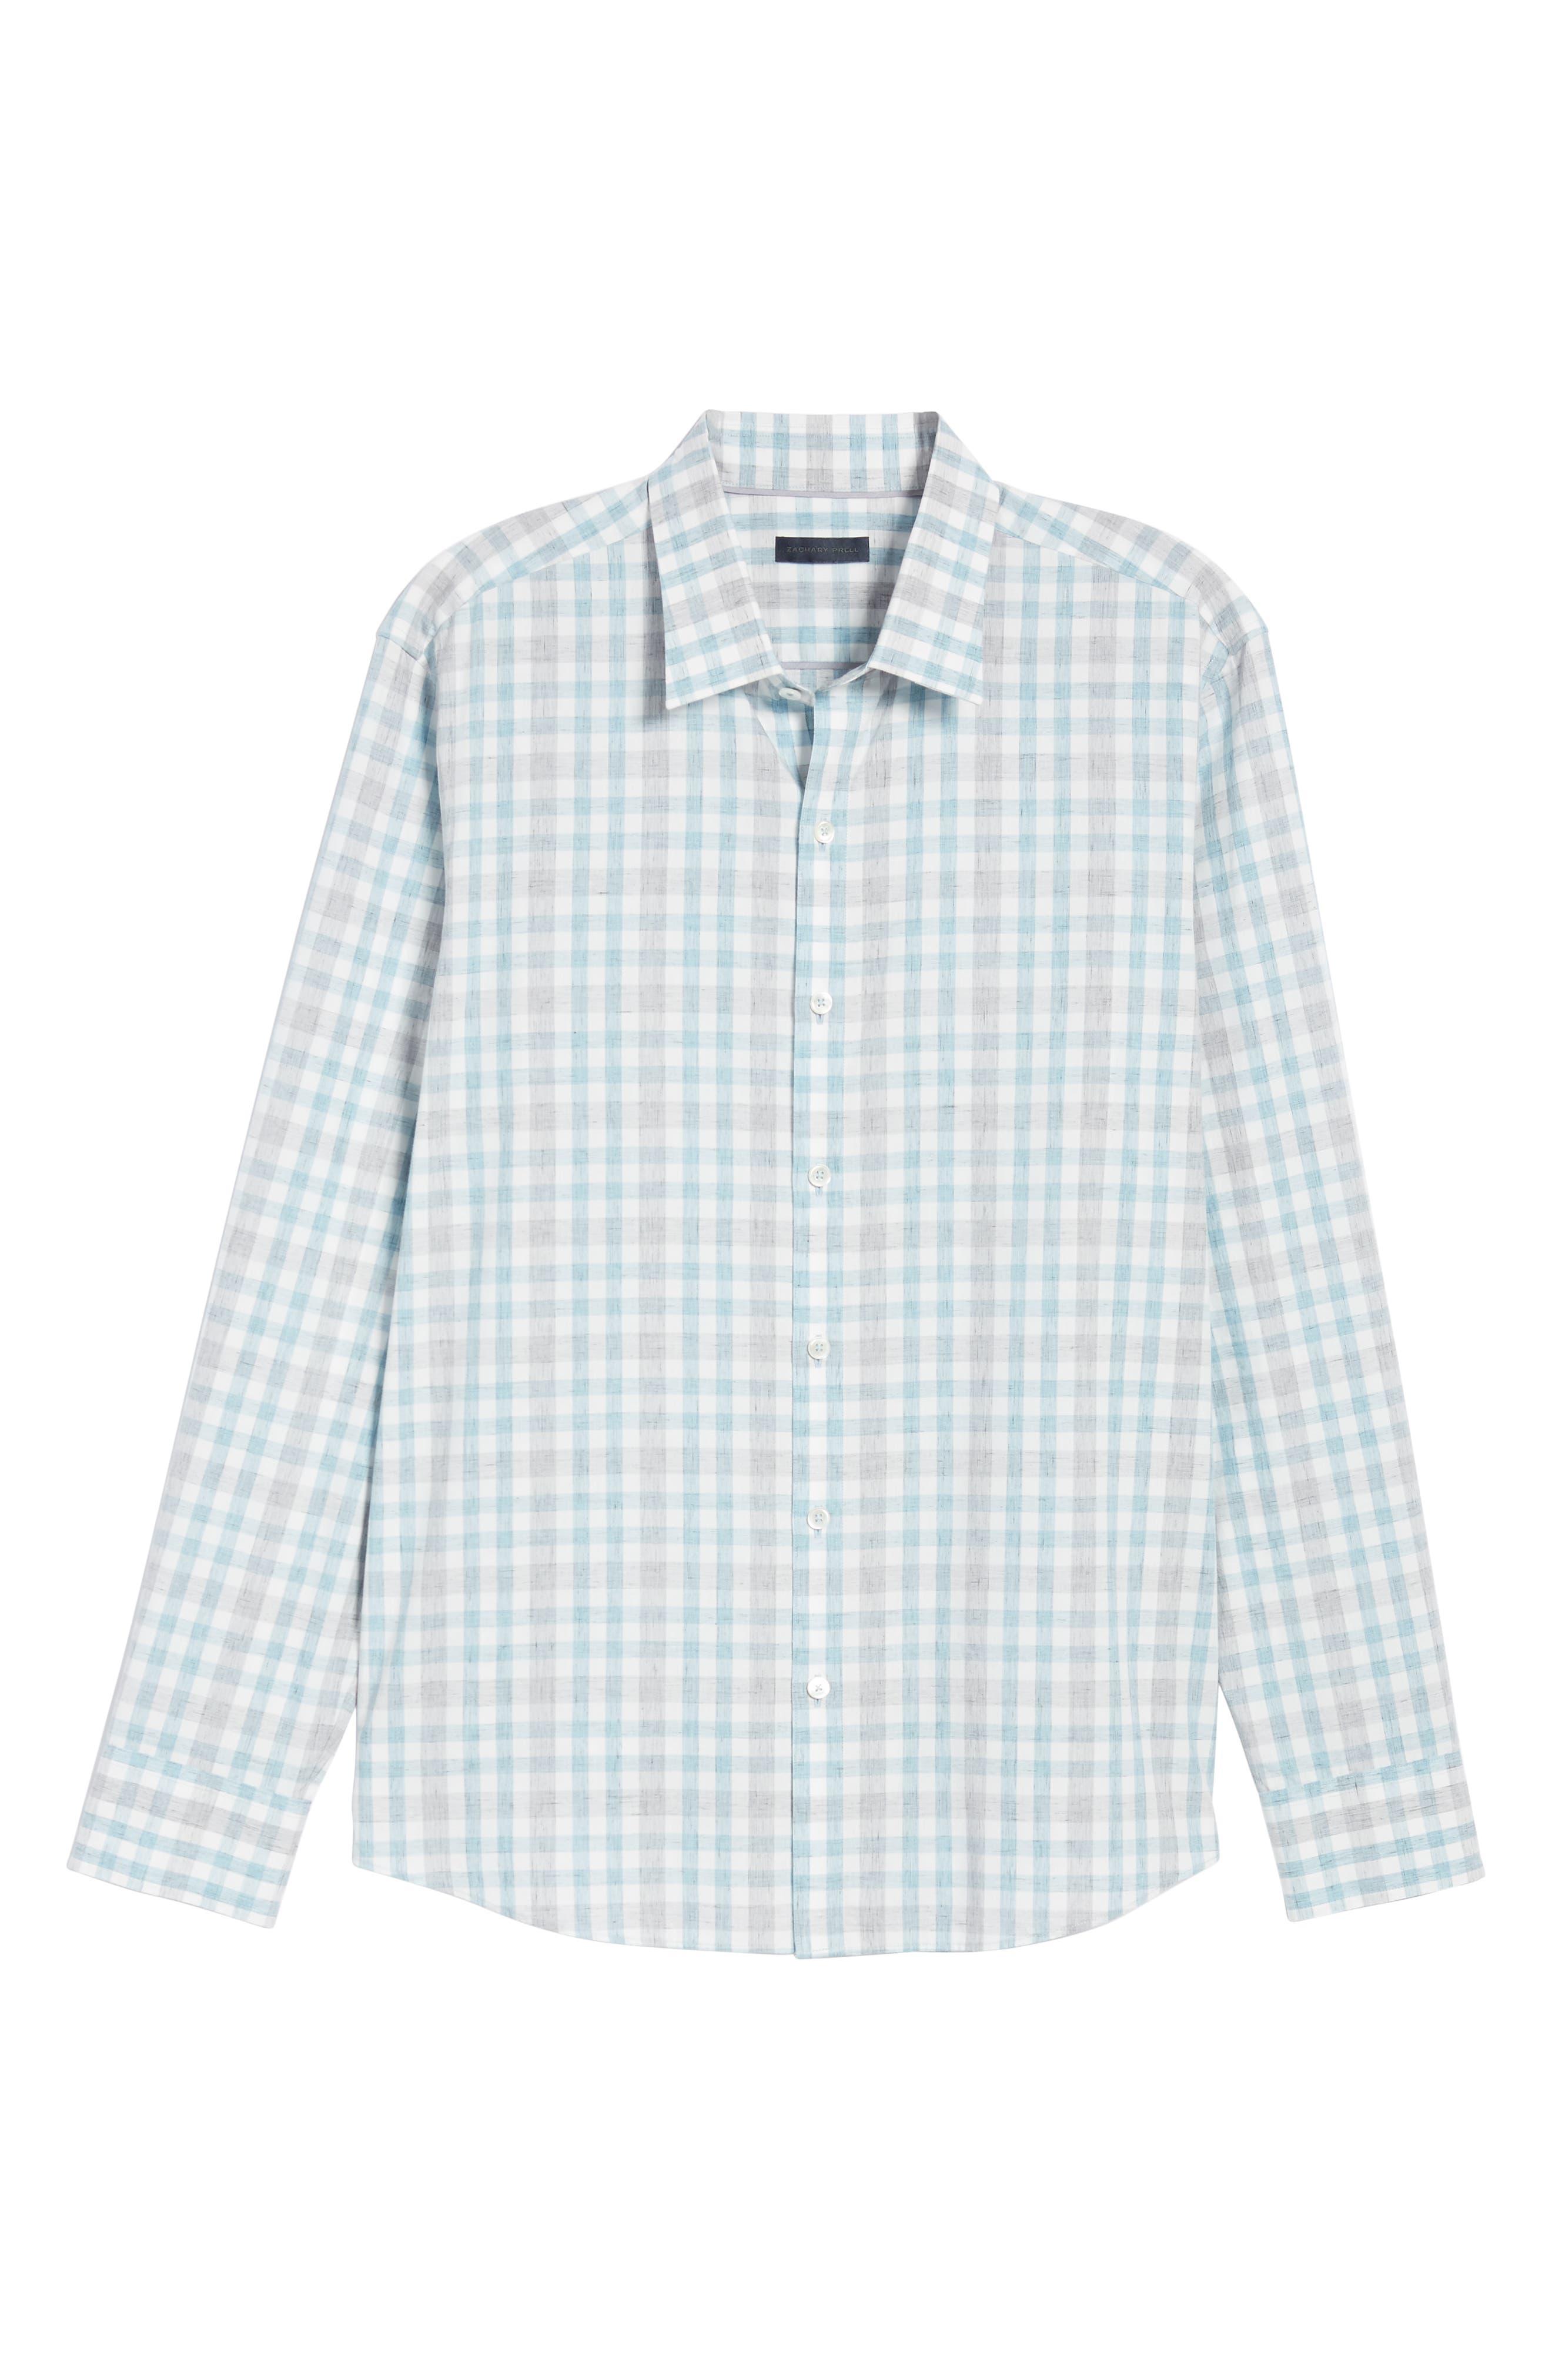 ZACHARY PRELL, Regular Fit Plaid Sport Shirt, Alternate thumbnail 5, color, LIGHT BLUE